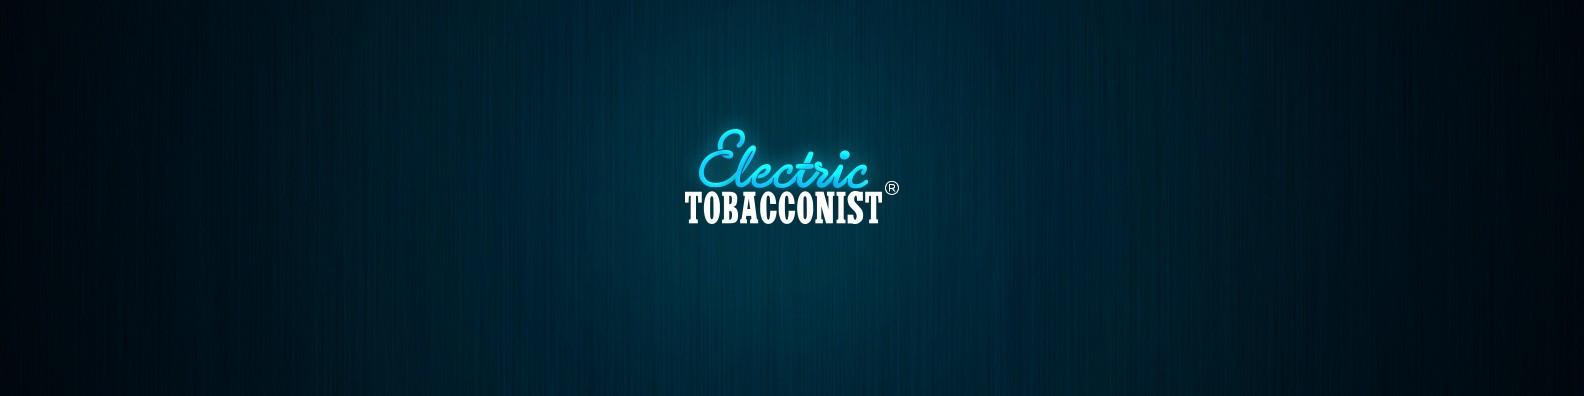 The Electric Tobacconist USA | LinkedIn